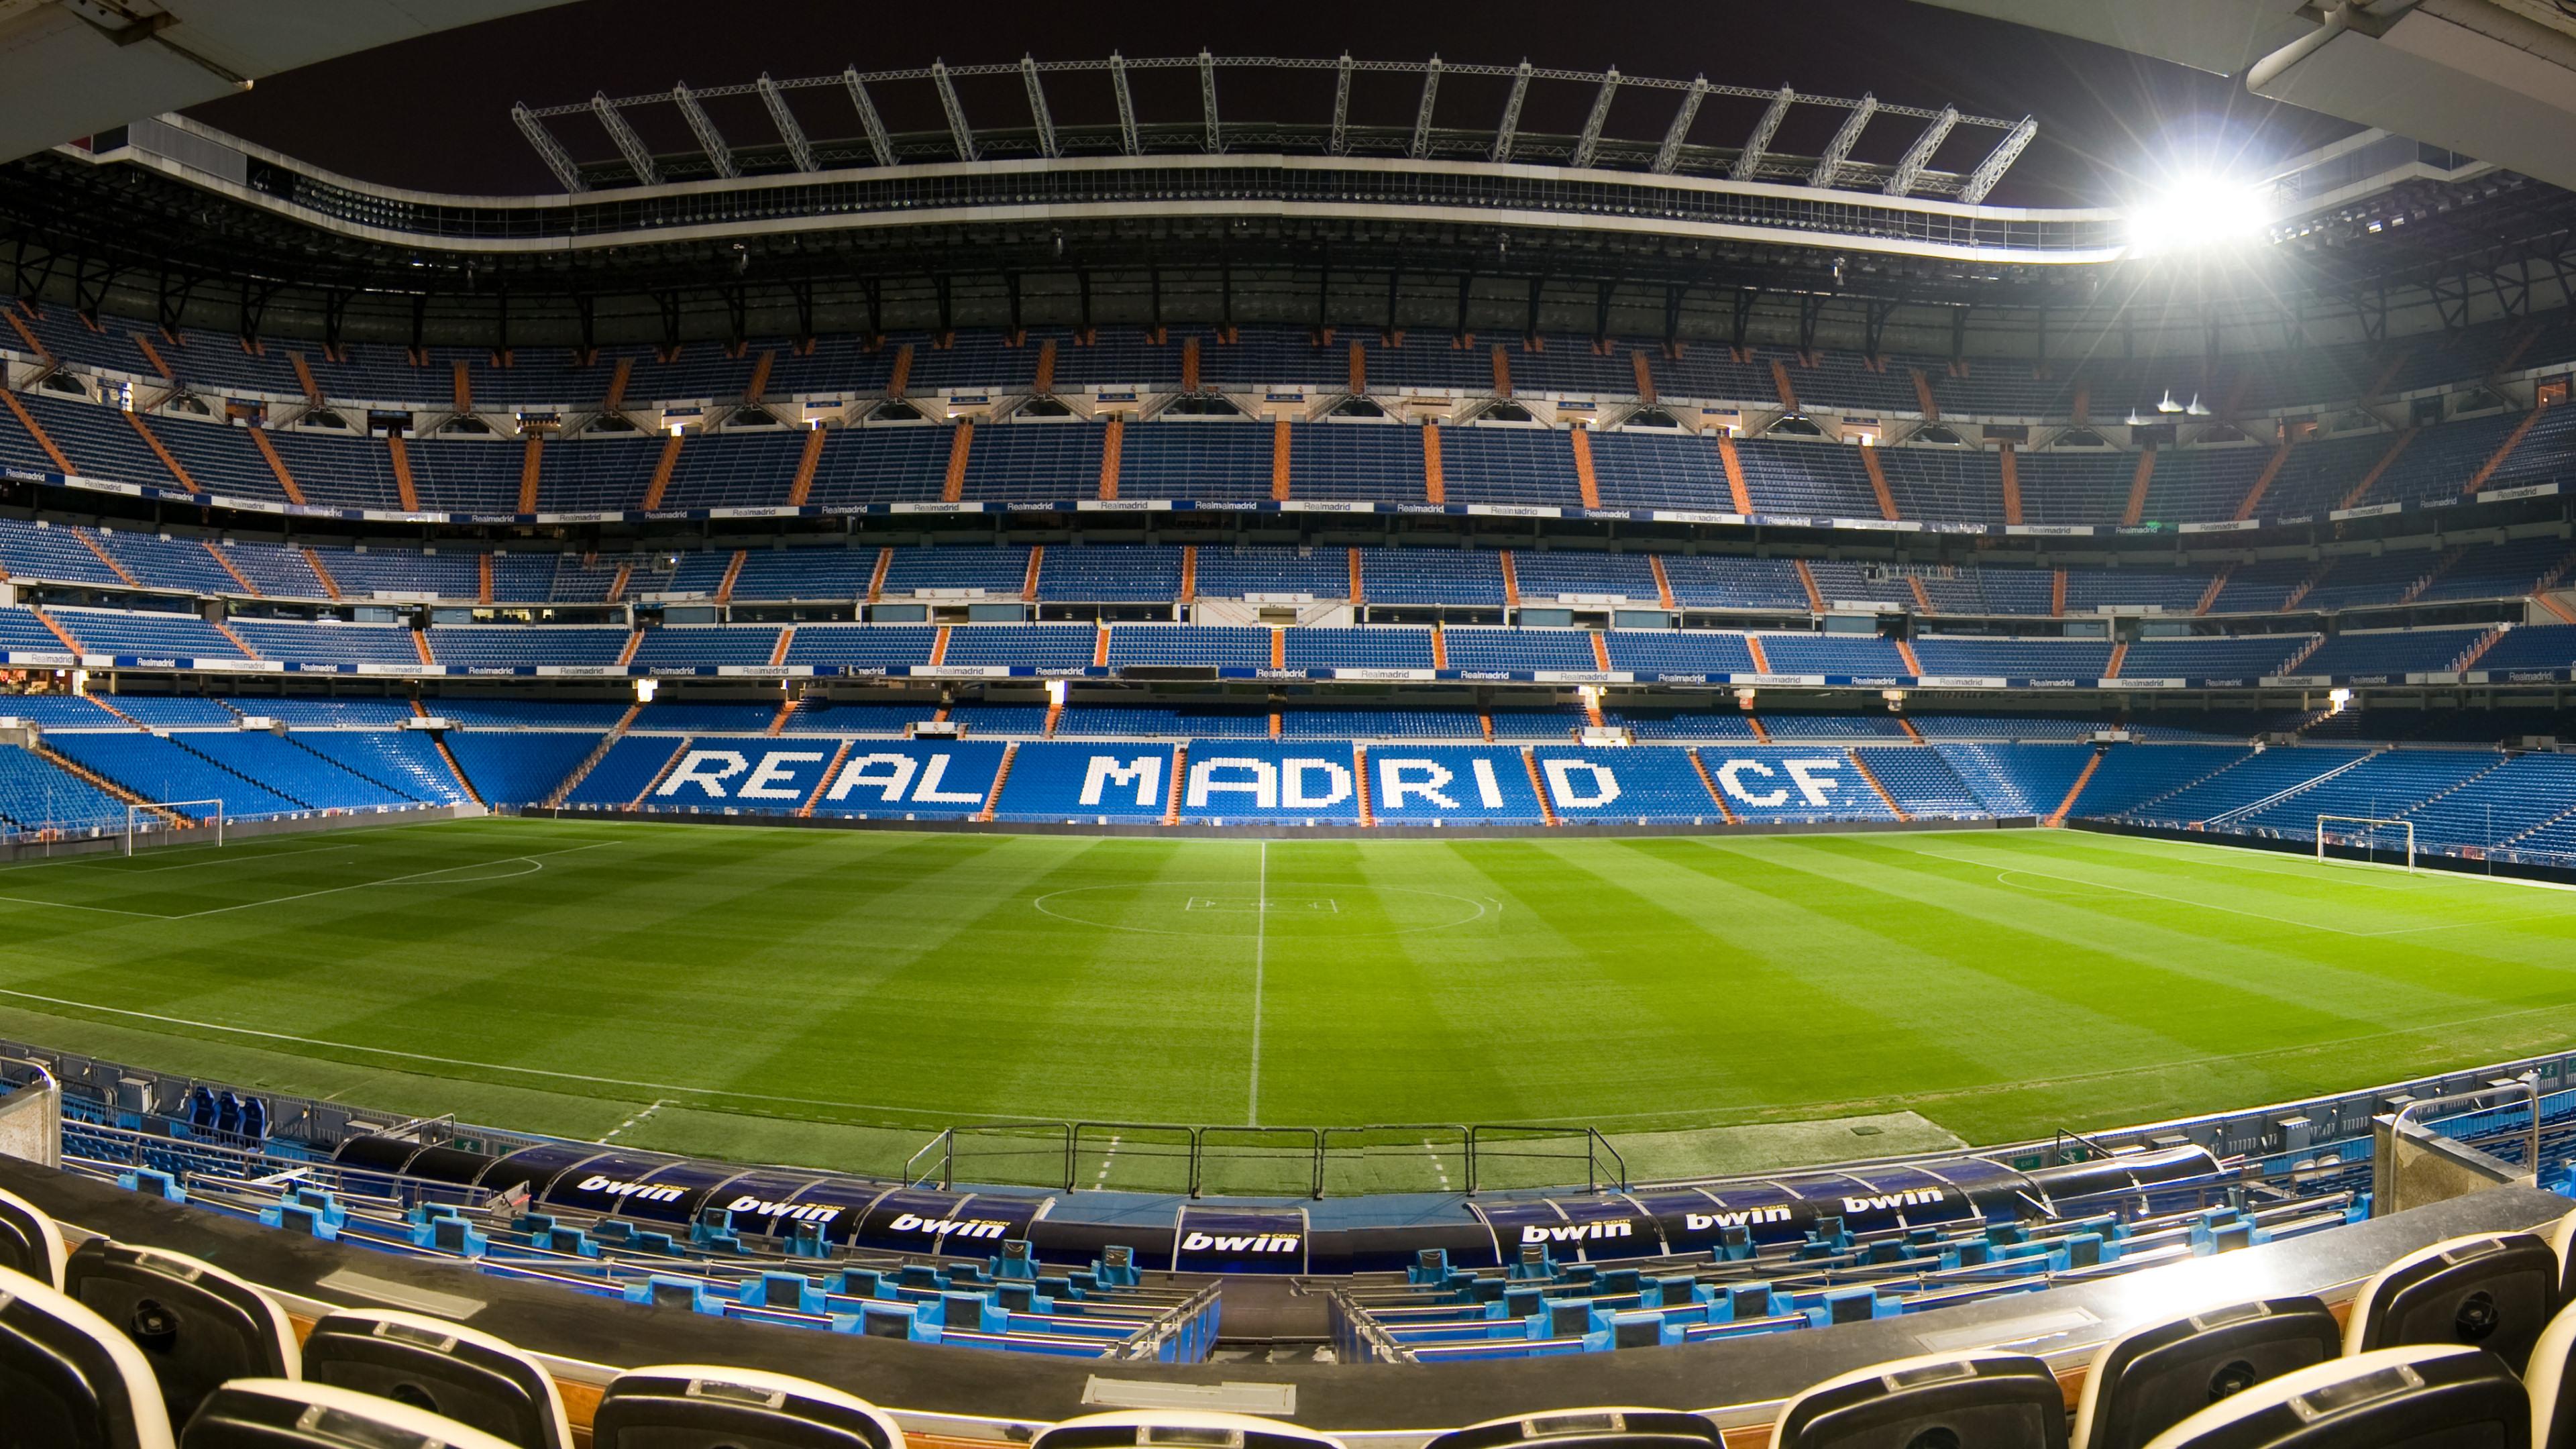 Hd Widescreen Christmas Desktop Wallpaper Real Madrid Stadium Wallpapers Hd Pixelstalk Net